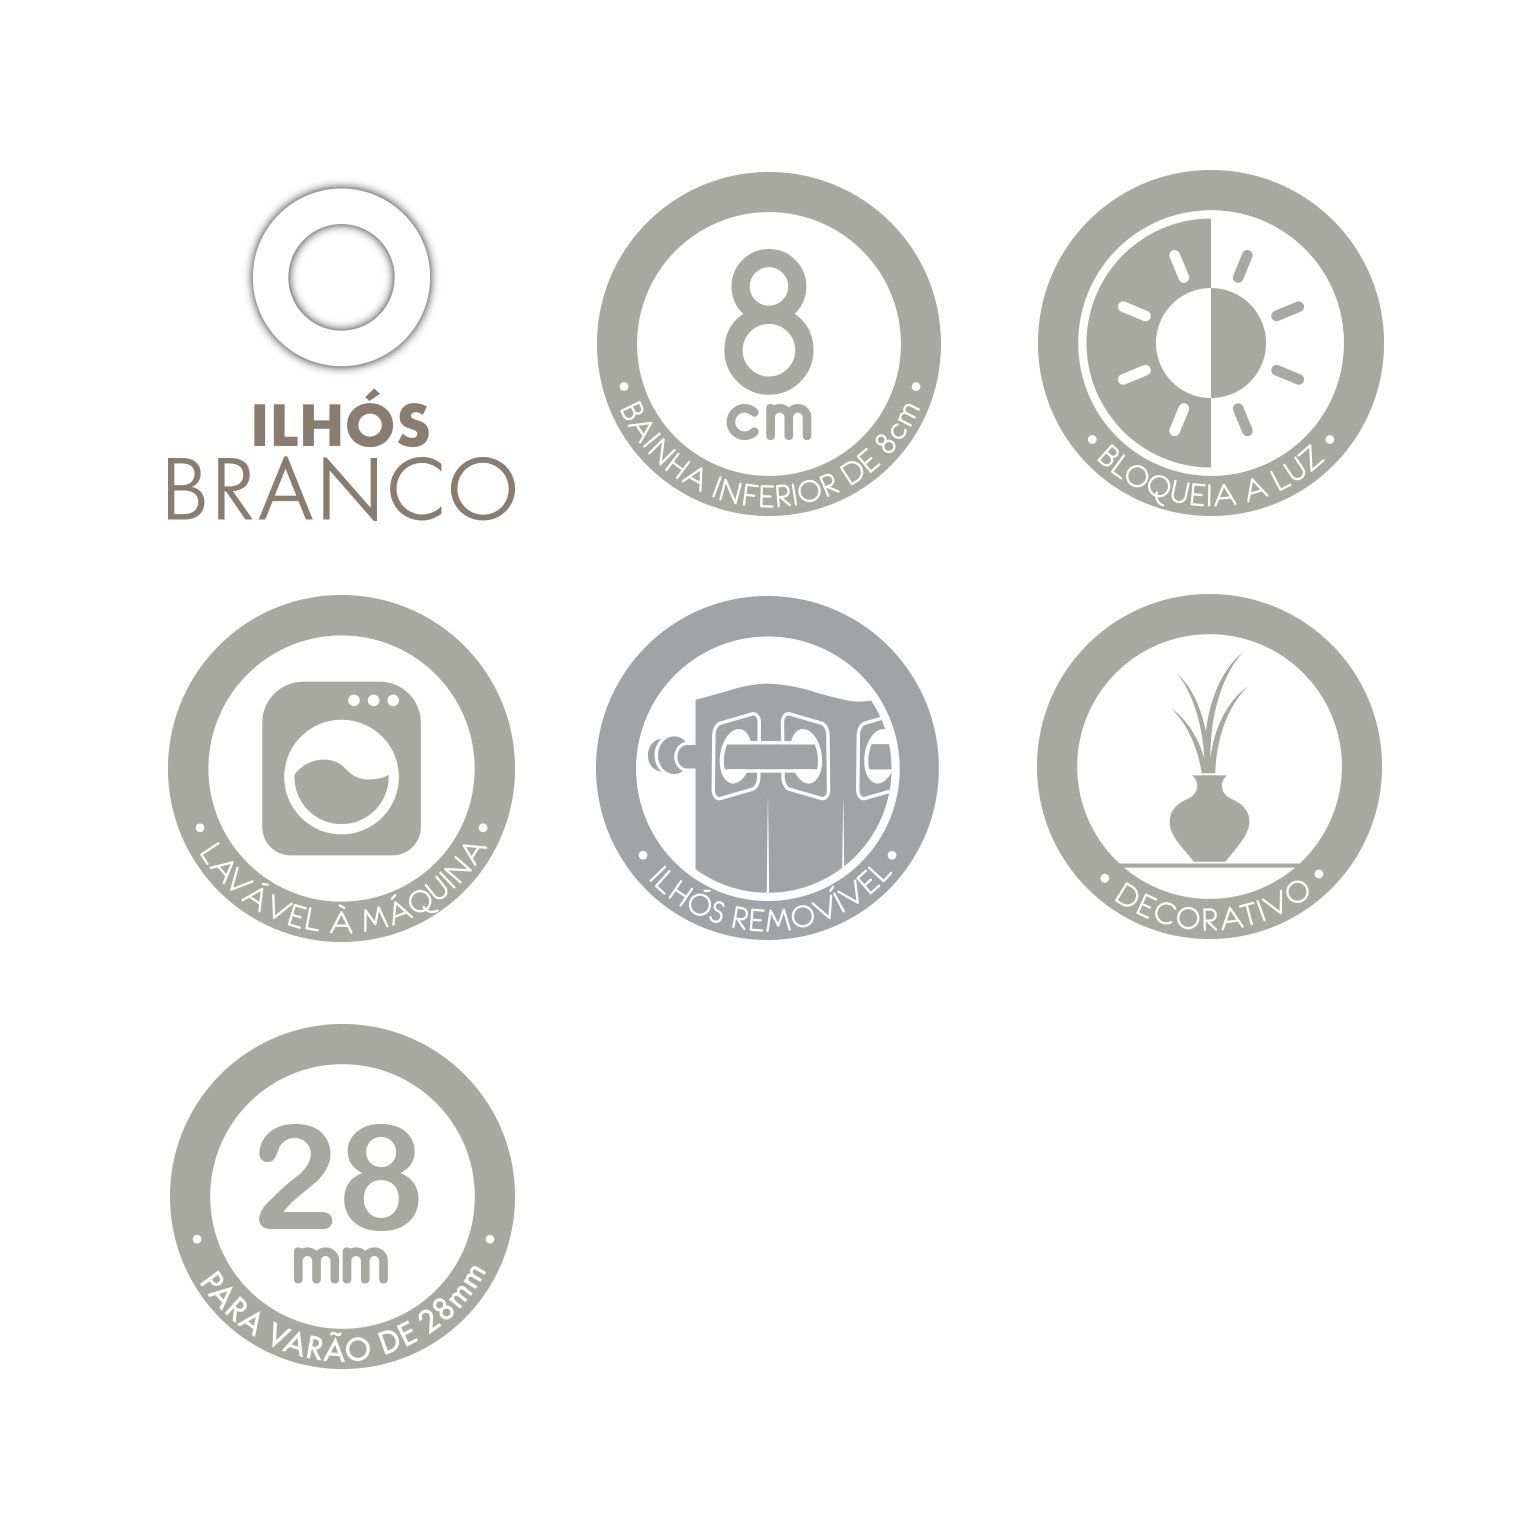 Cortina Infantil Borboletas Com forro Blackout 2,00 x 1,80 santista